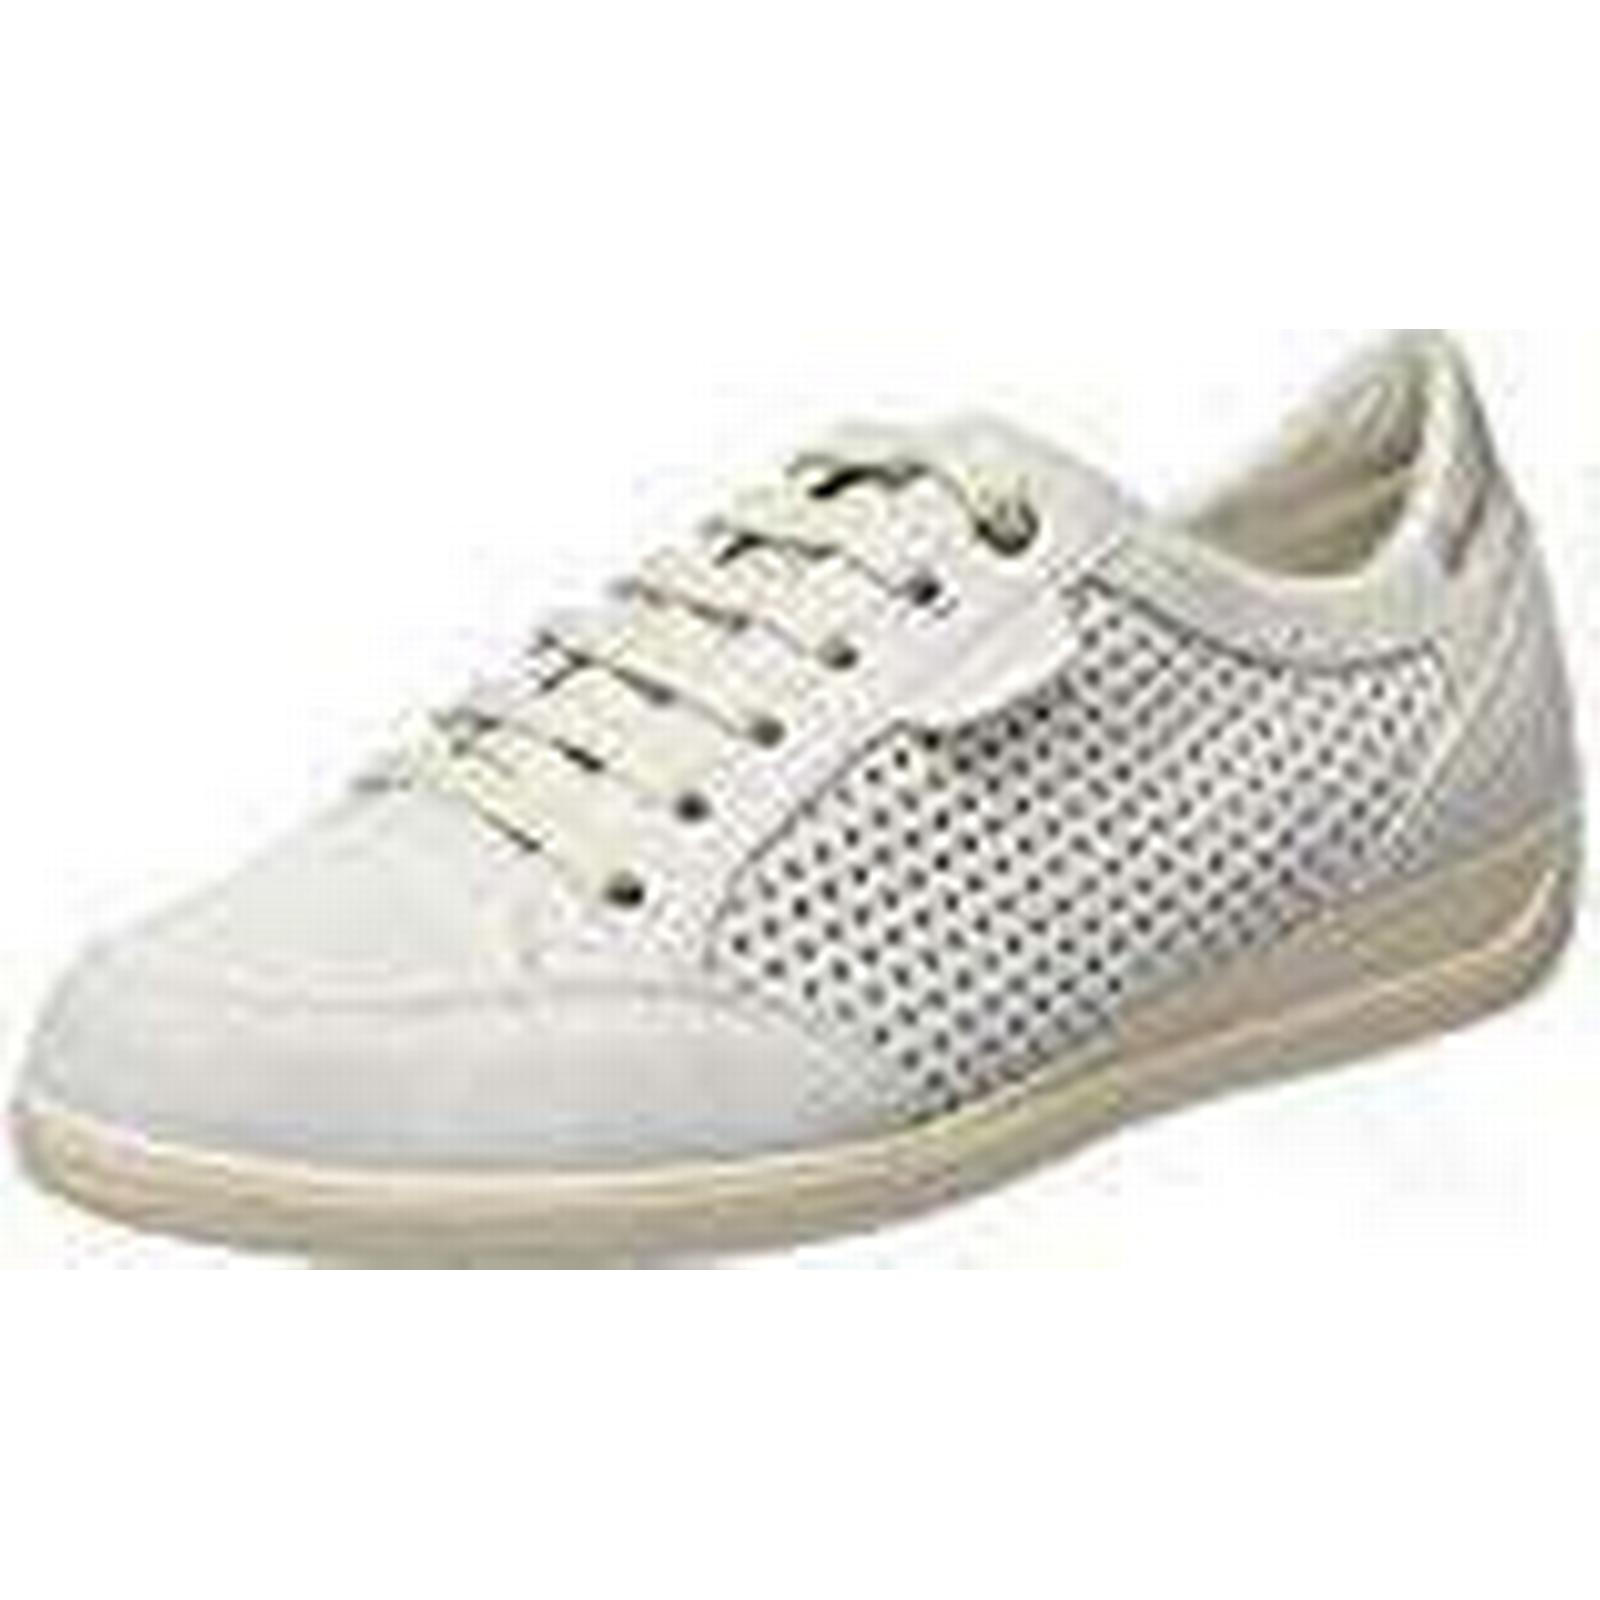 Geox Women's D Myria B 8 Low-Top Sneakers, Off White, 8 B UK 8 UK 21a49d